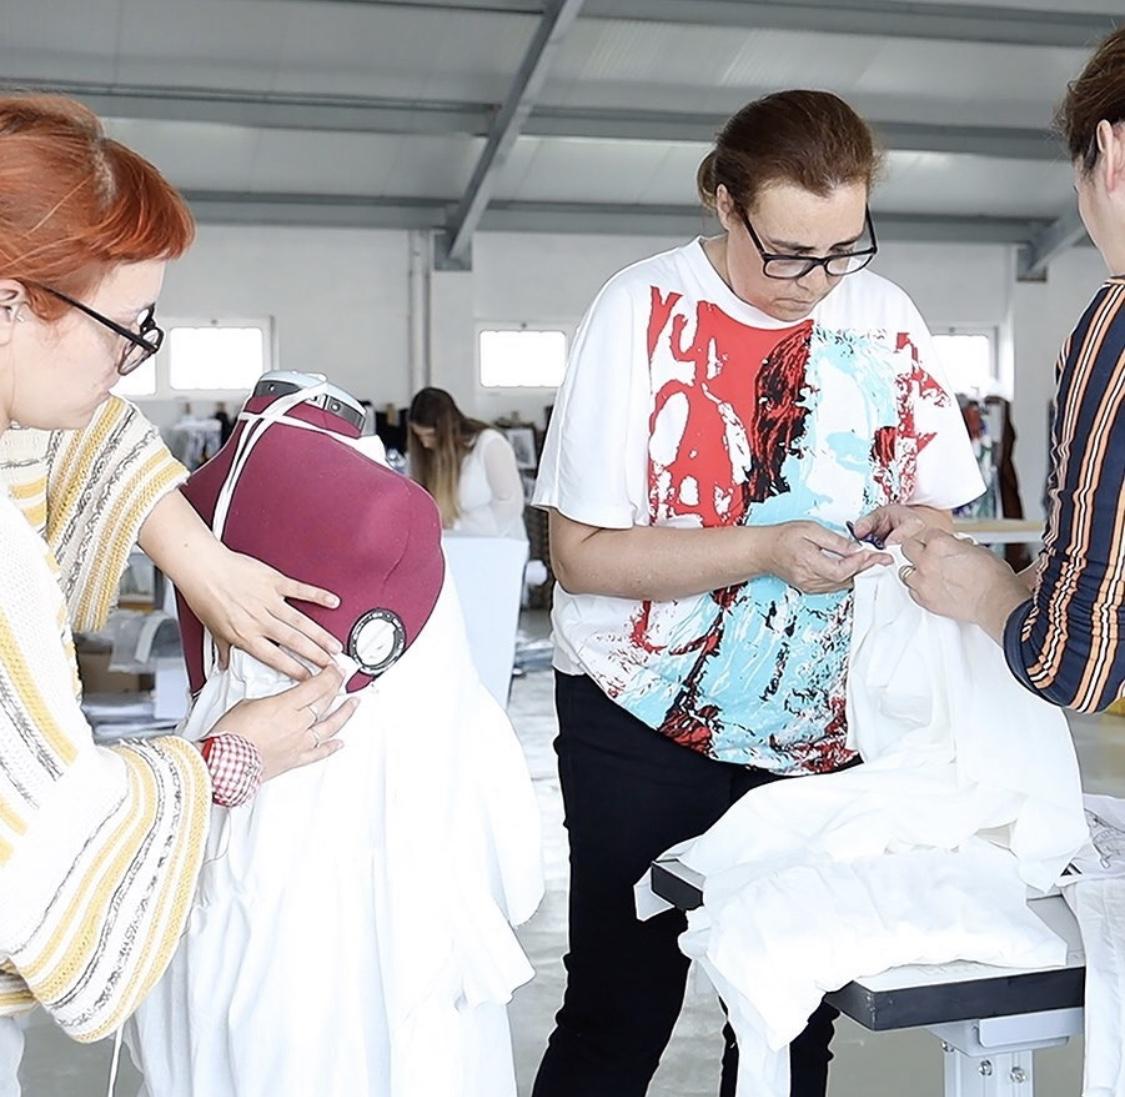 London Fashion Week Goes Digital, Gender Neutral And More